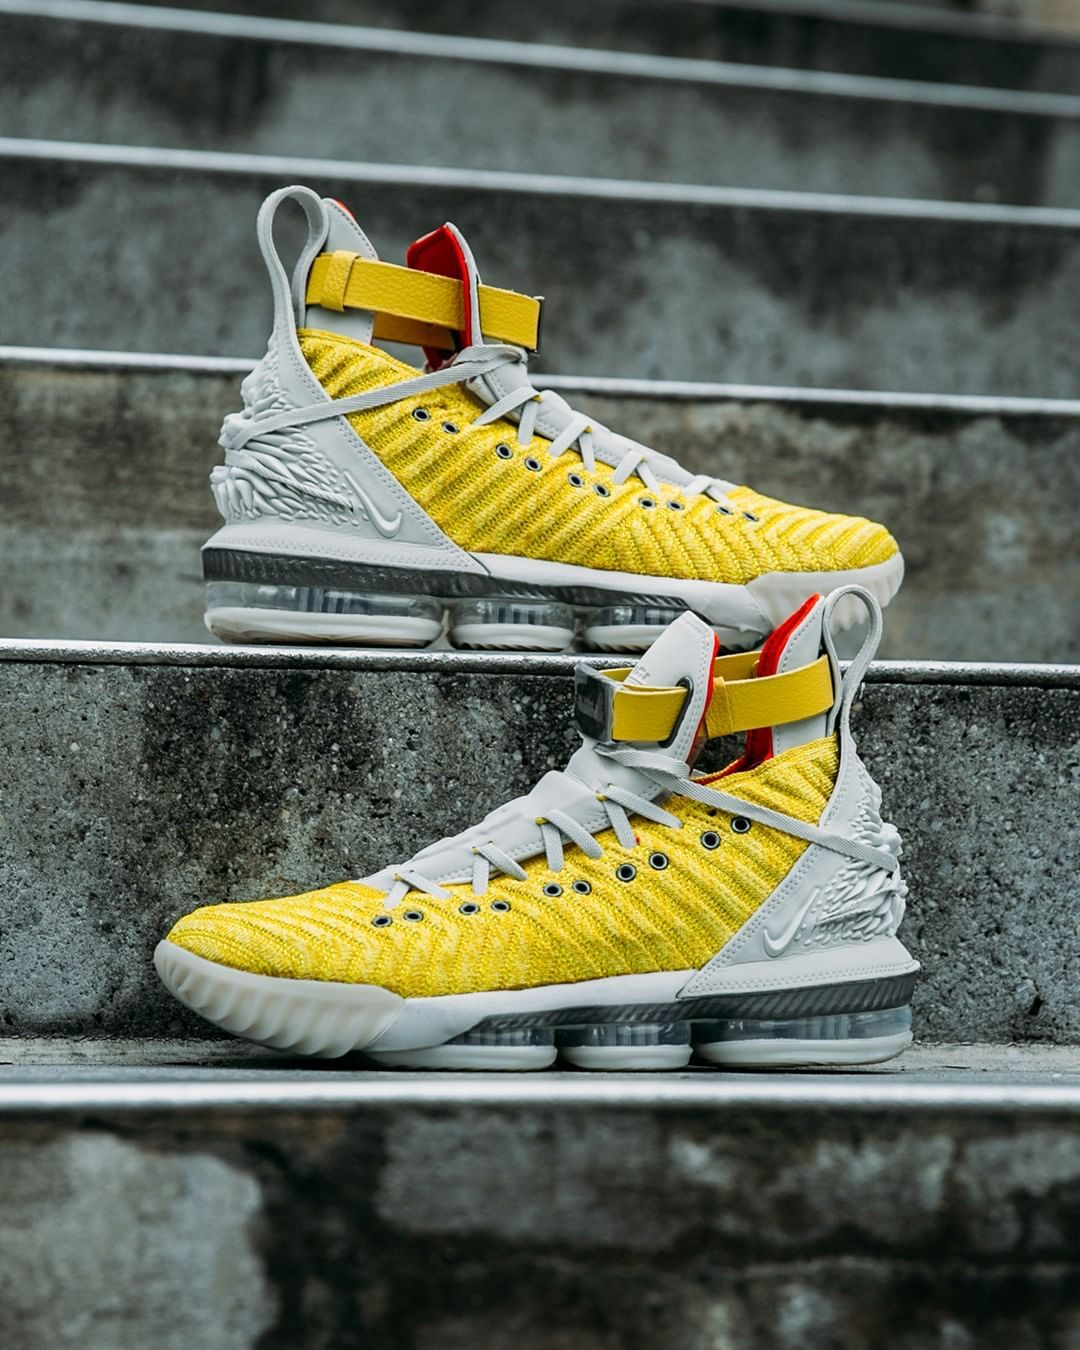 Nike, Foot locker, Nike lebron